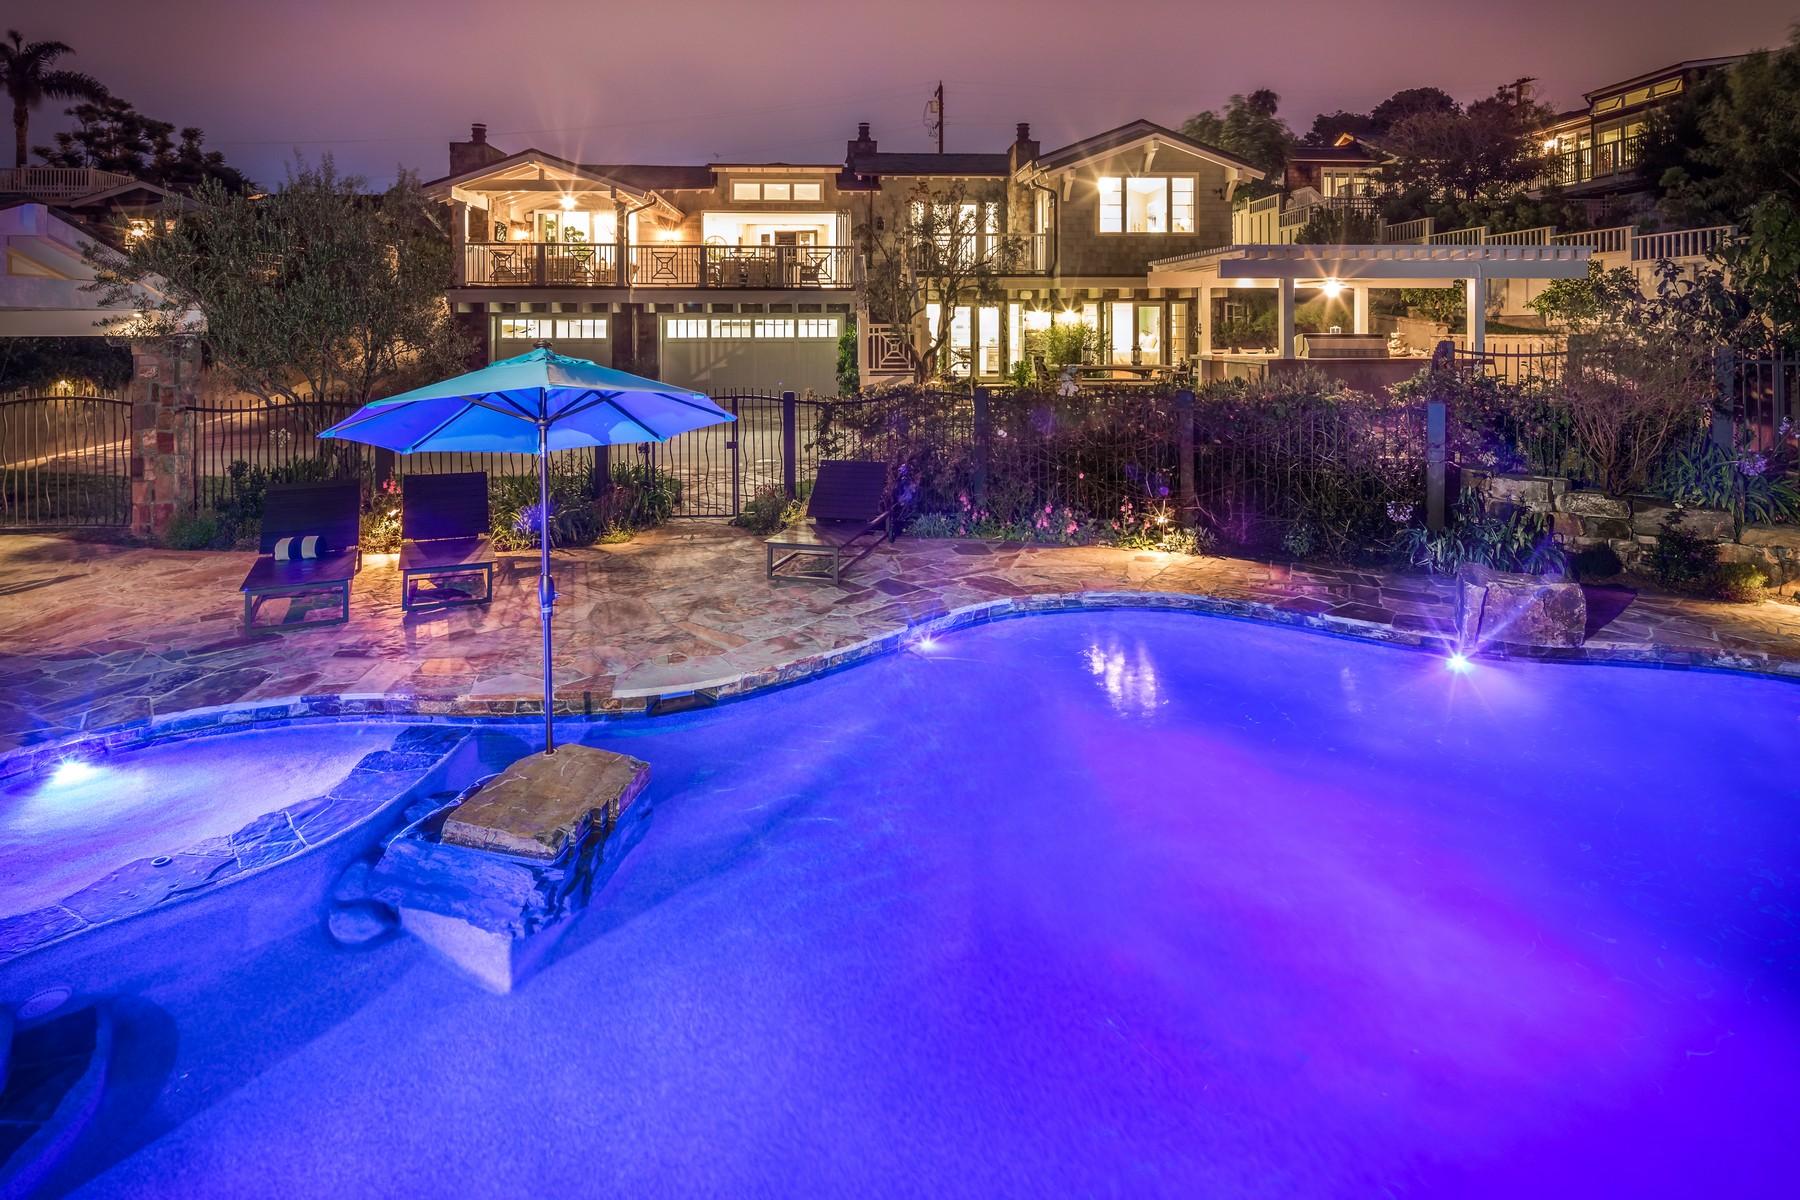 Single Family Home for Sale at 235 S Granados Avenue Solana Beach, California, 92075 United States